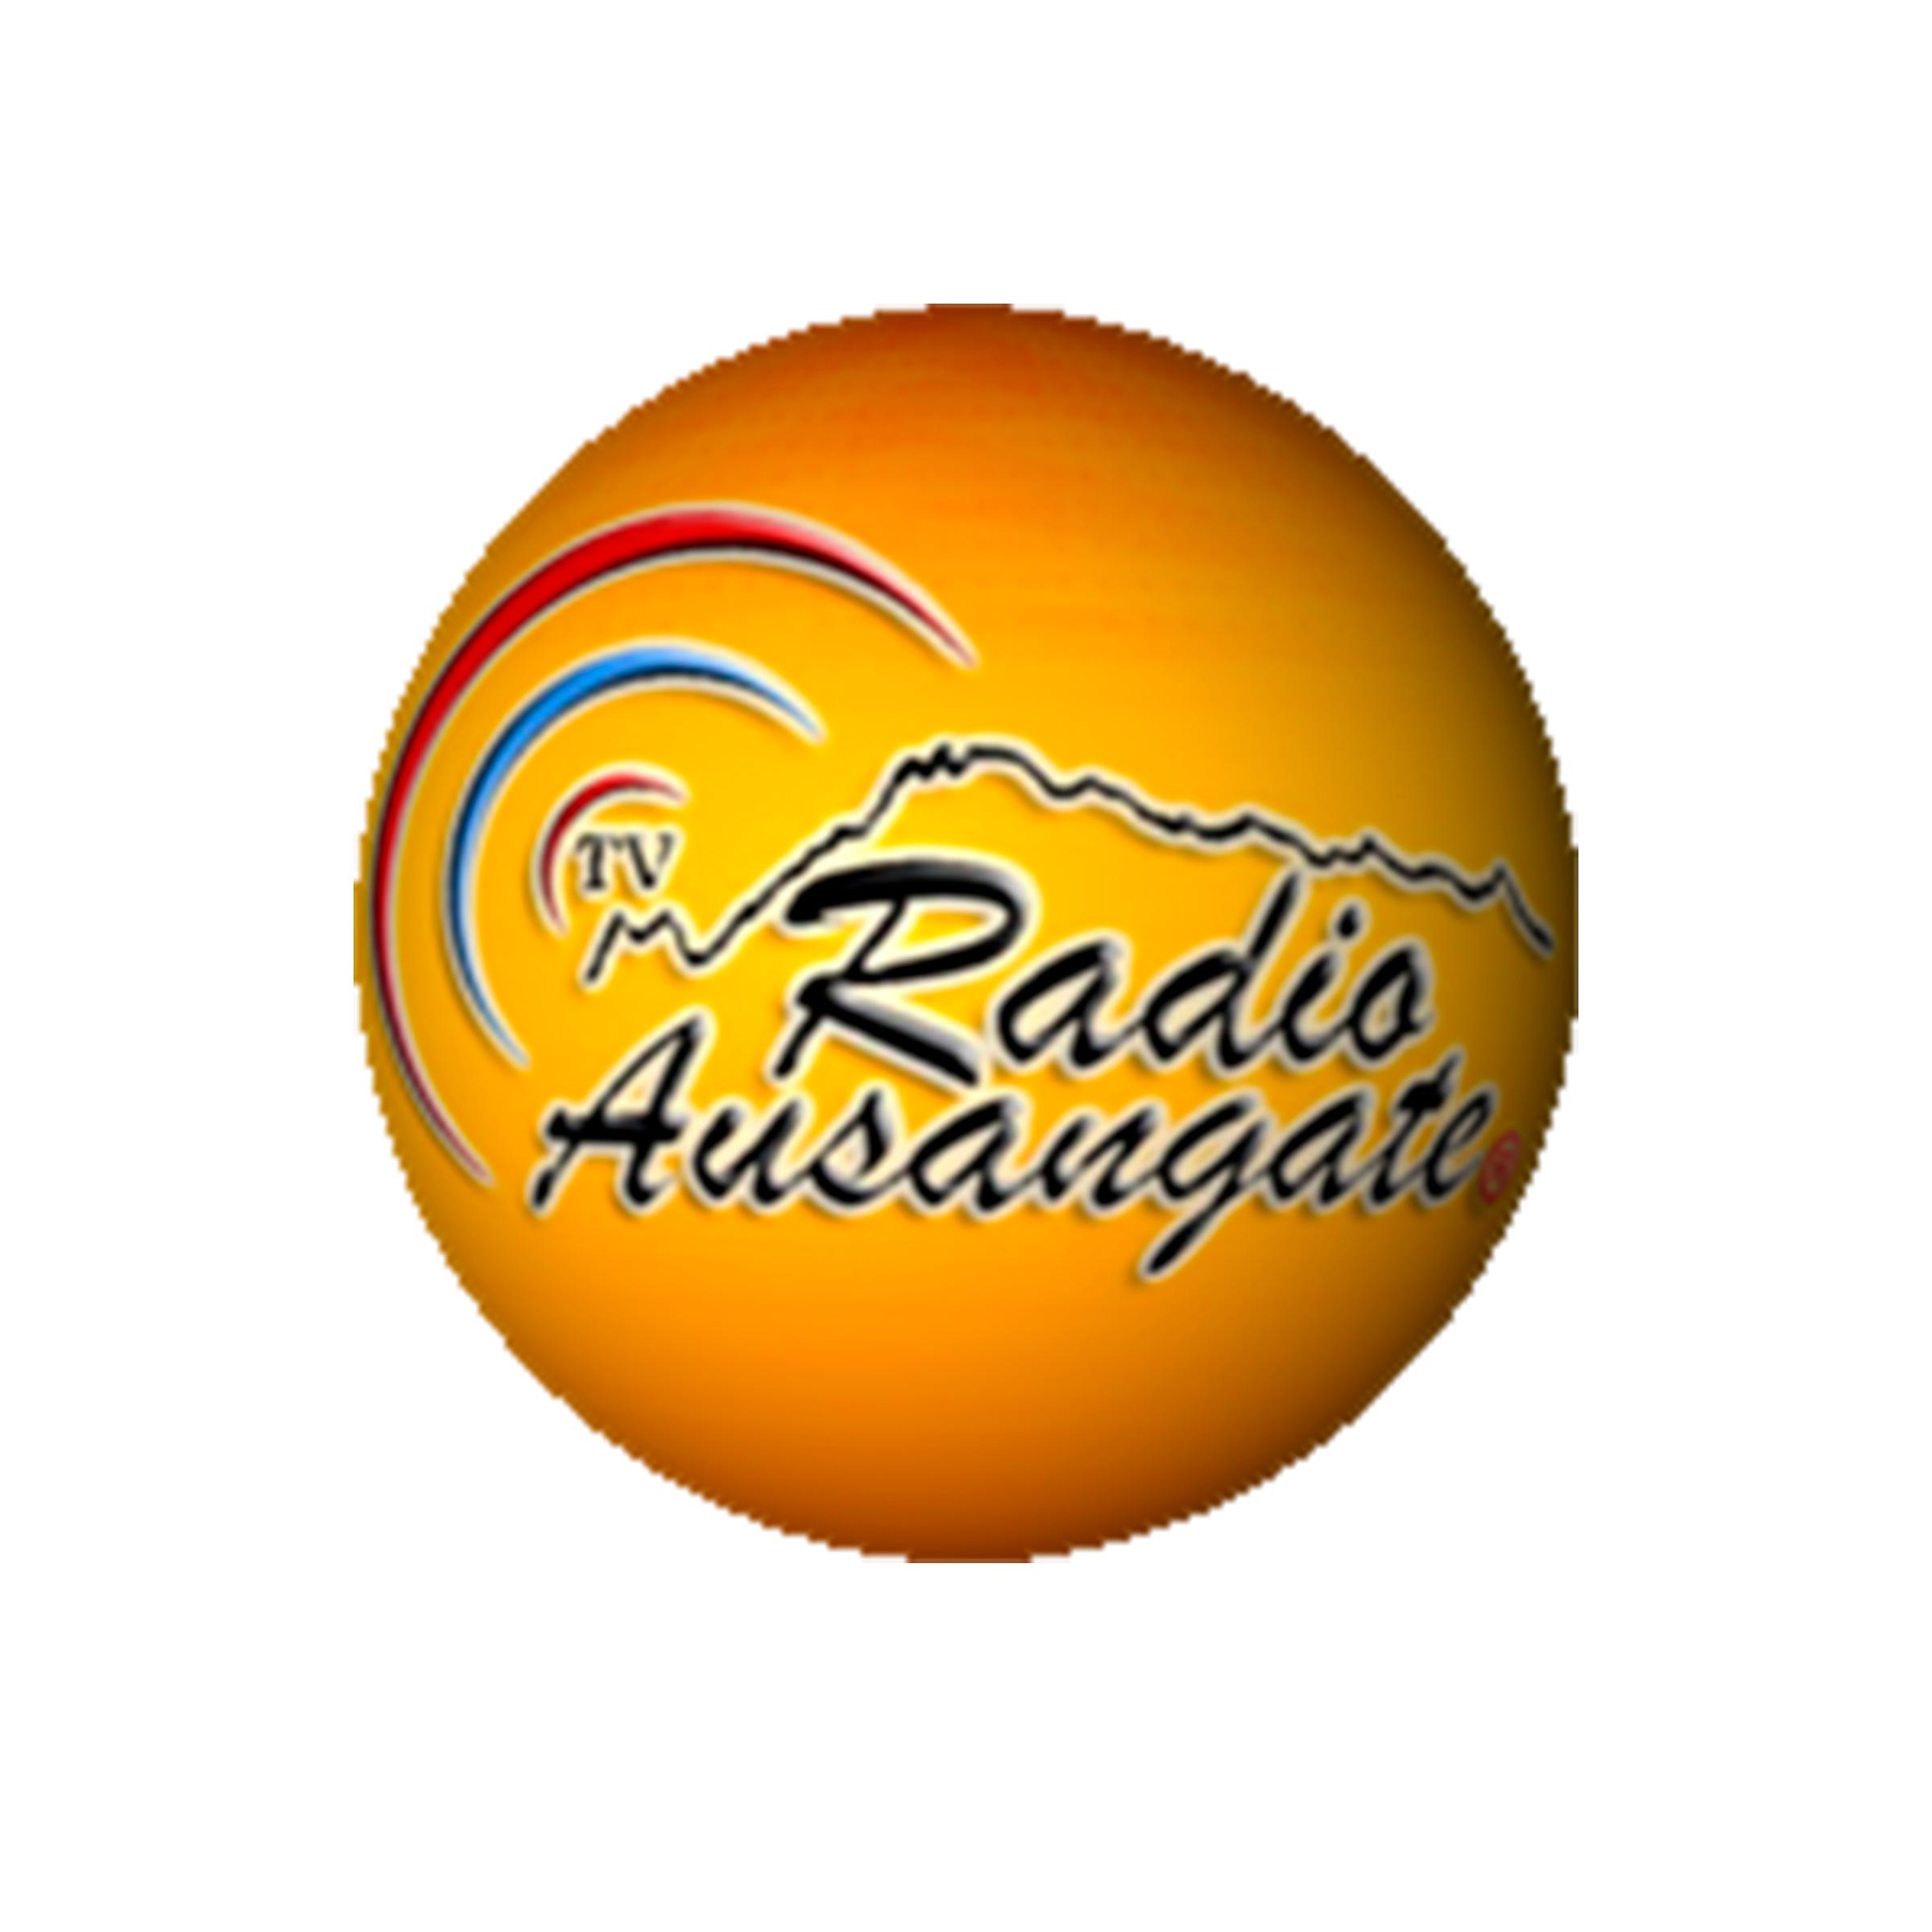 radio ausangate